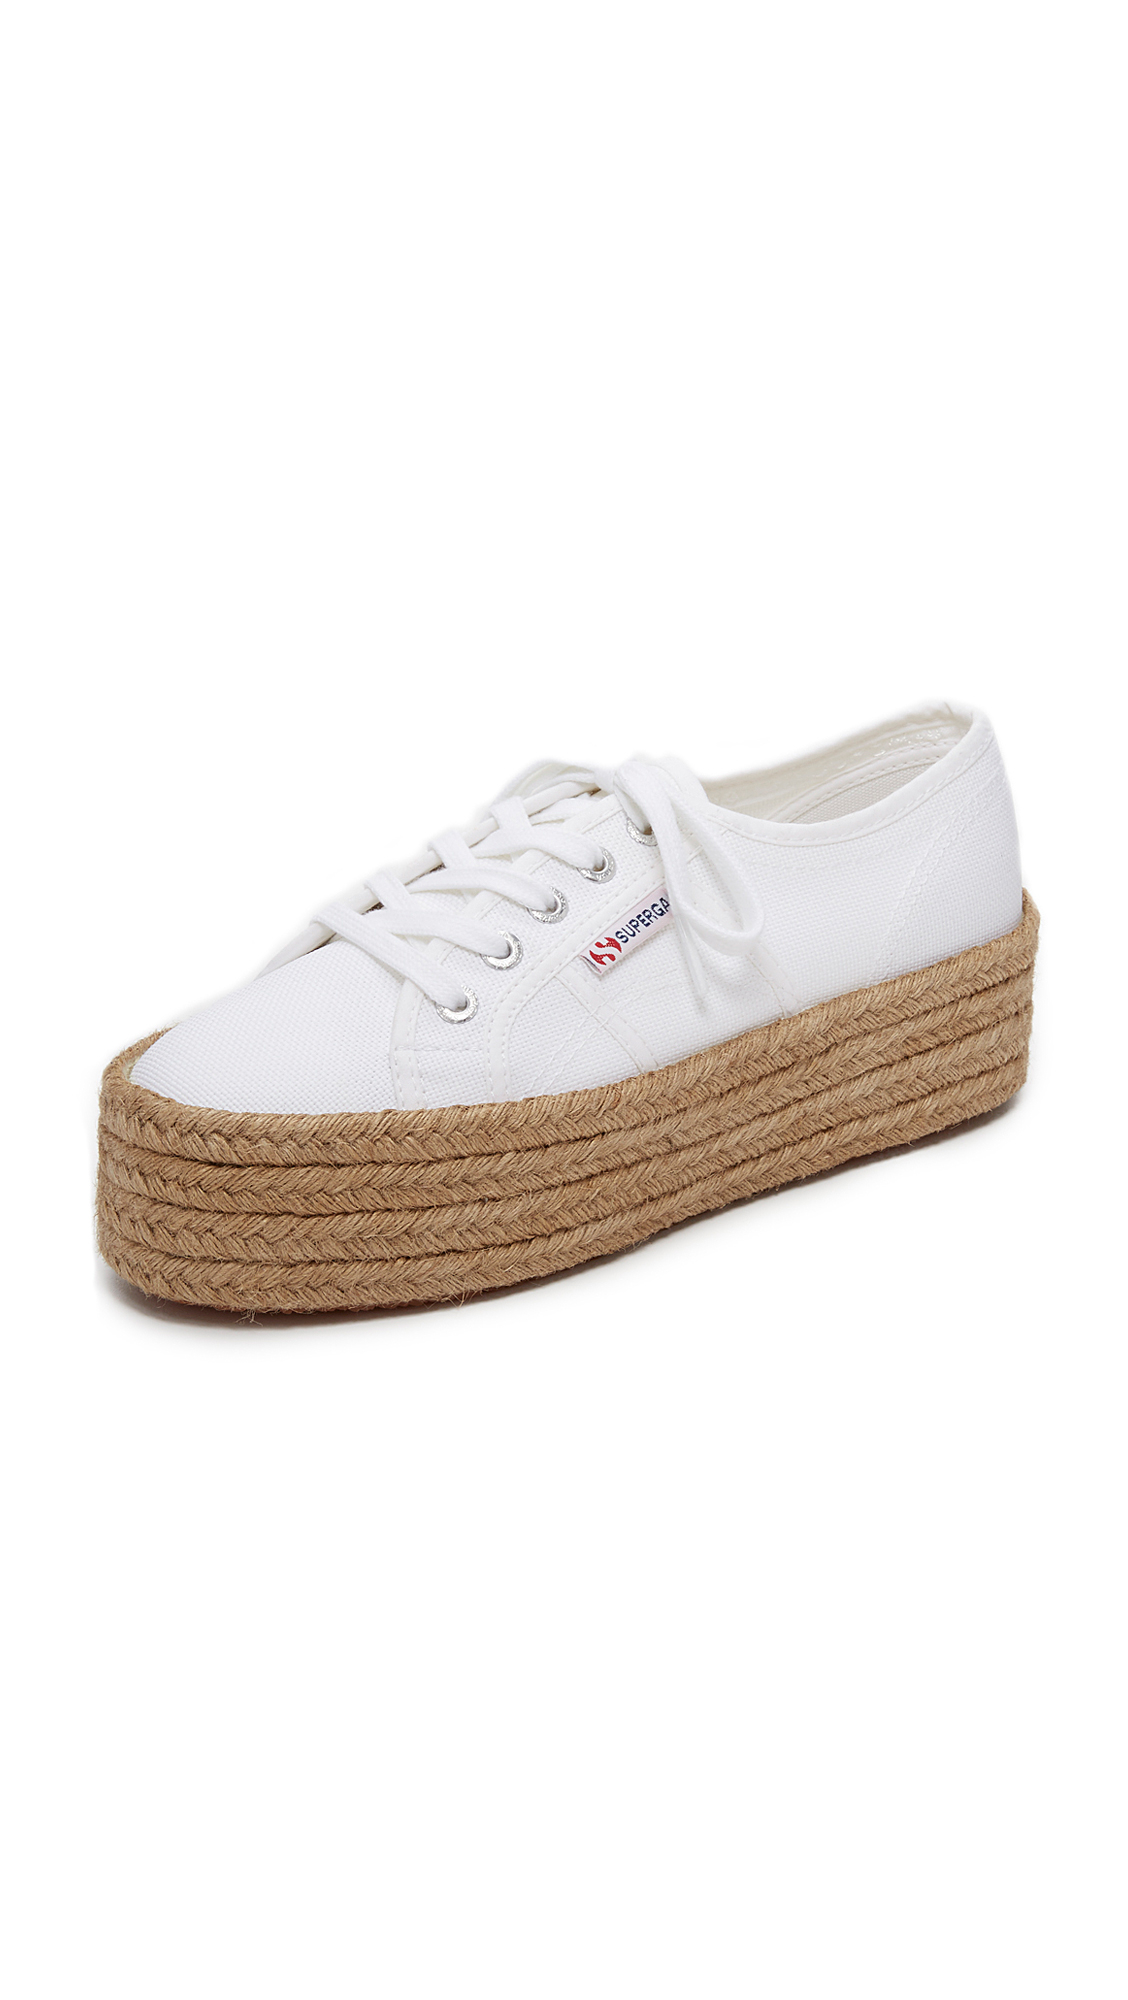 Superga: Superga 2790 Platform Espadrille Sneakers In White